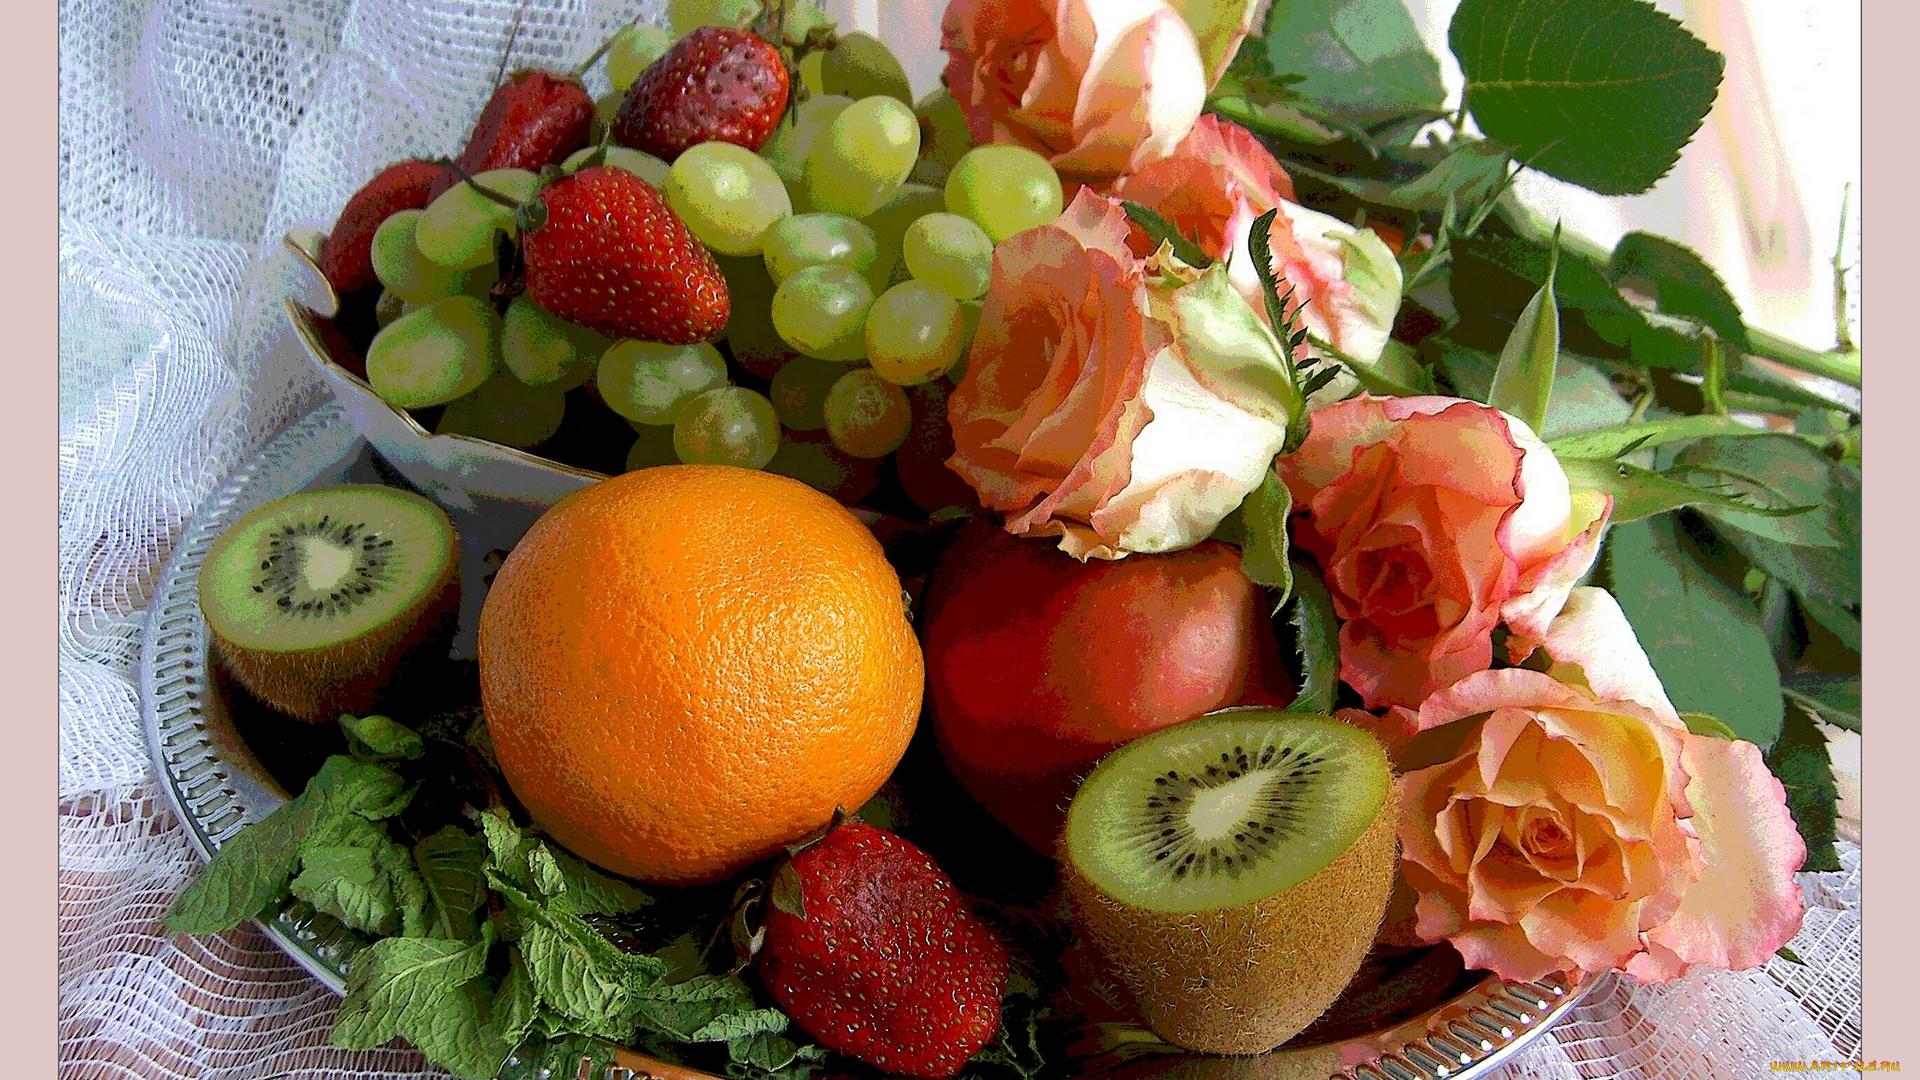 Цветы фрукты открытка